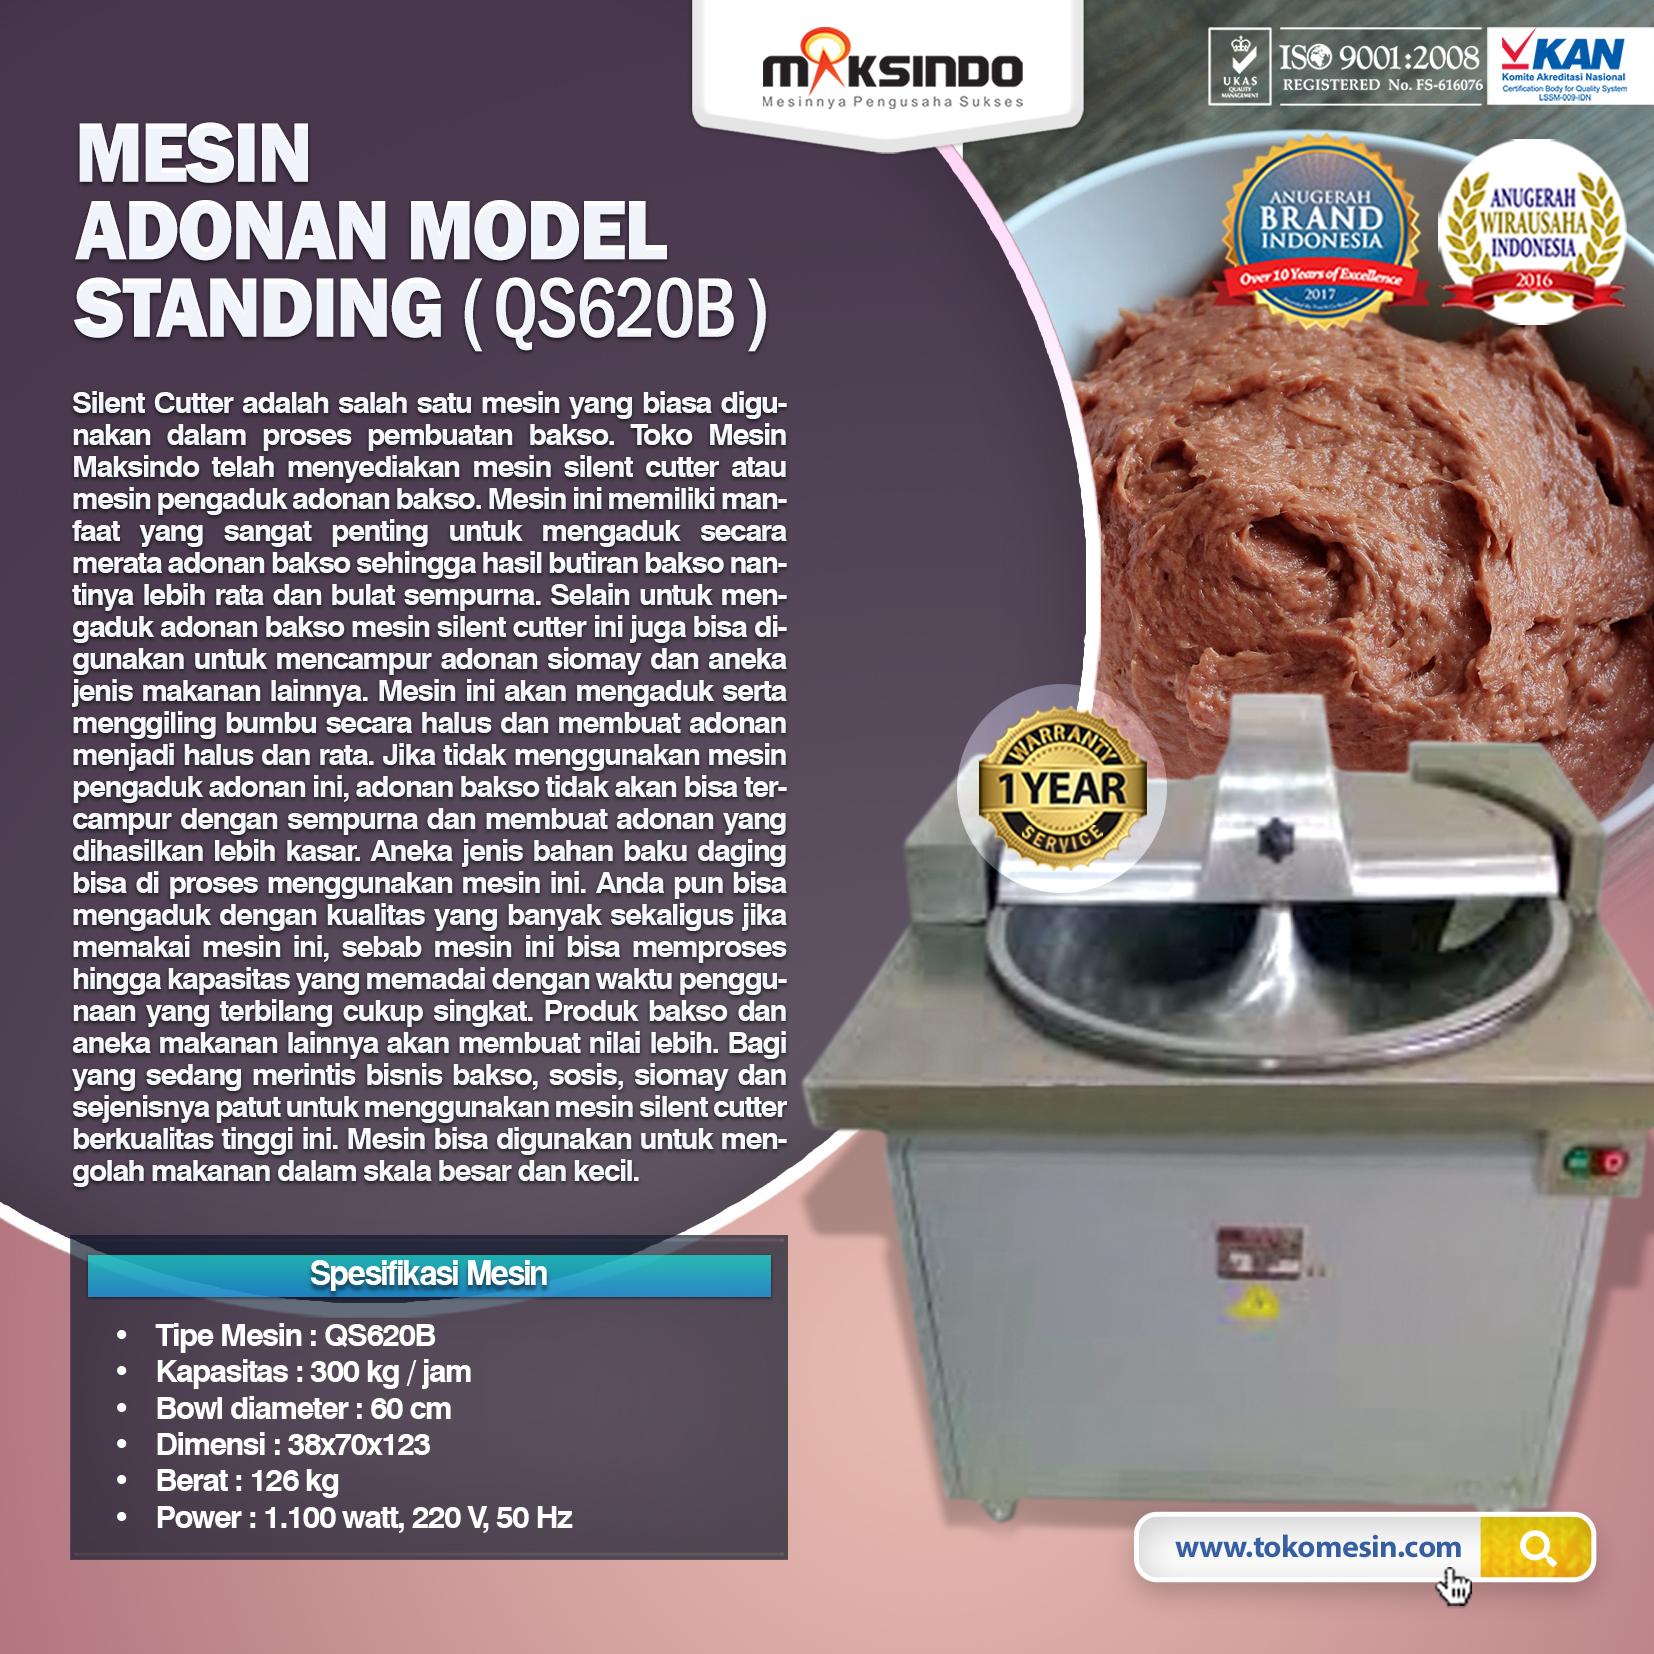 Mesin Adonan Model Standing QS620B